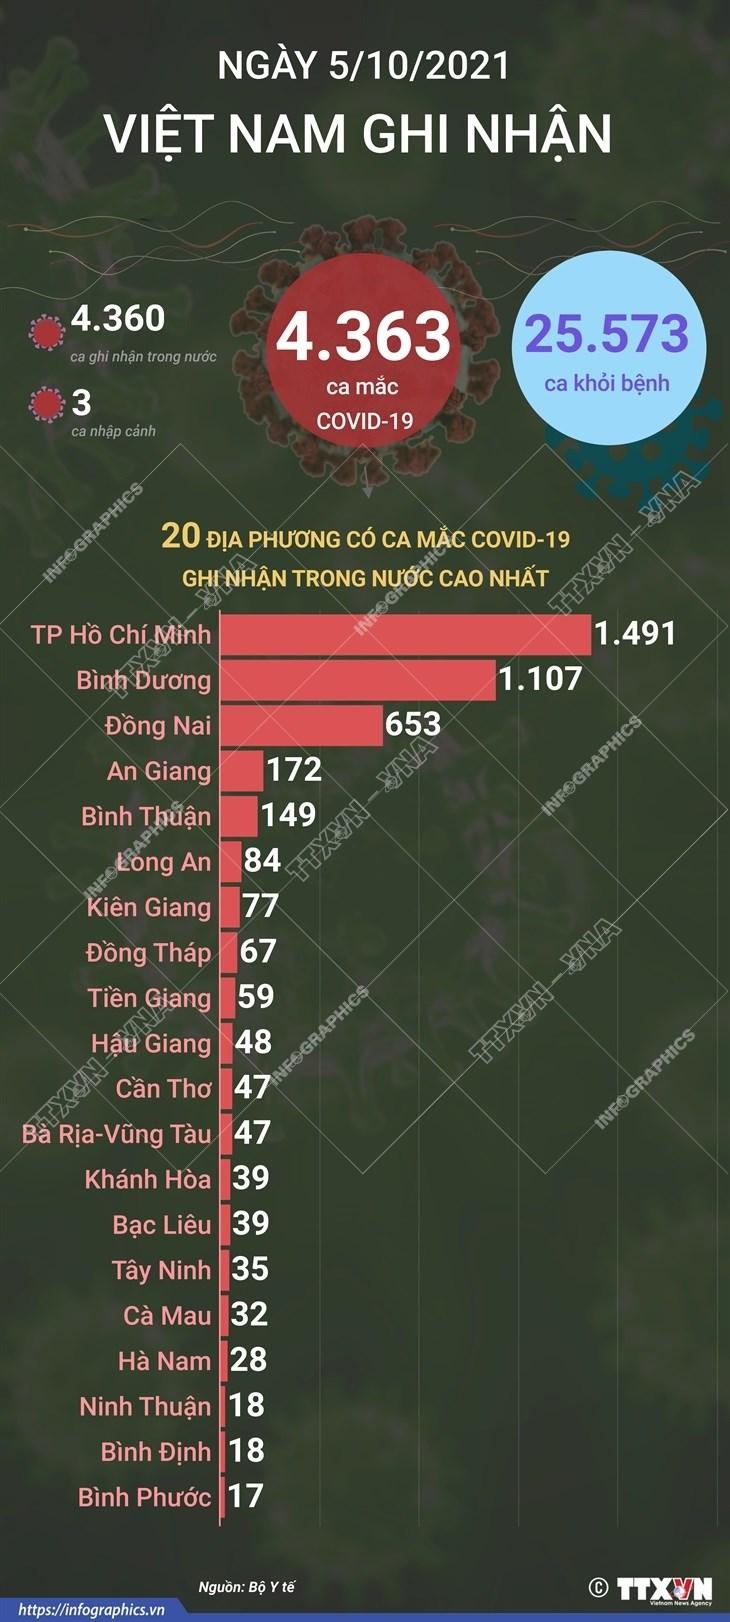 [Infographics] Ngay 5/10, so ca khoi benh cao xap xi 6 lan ca mac moi hinh anh 1